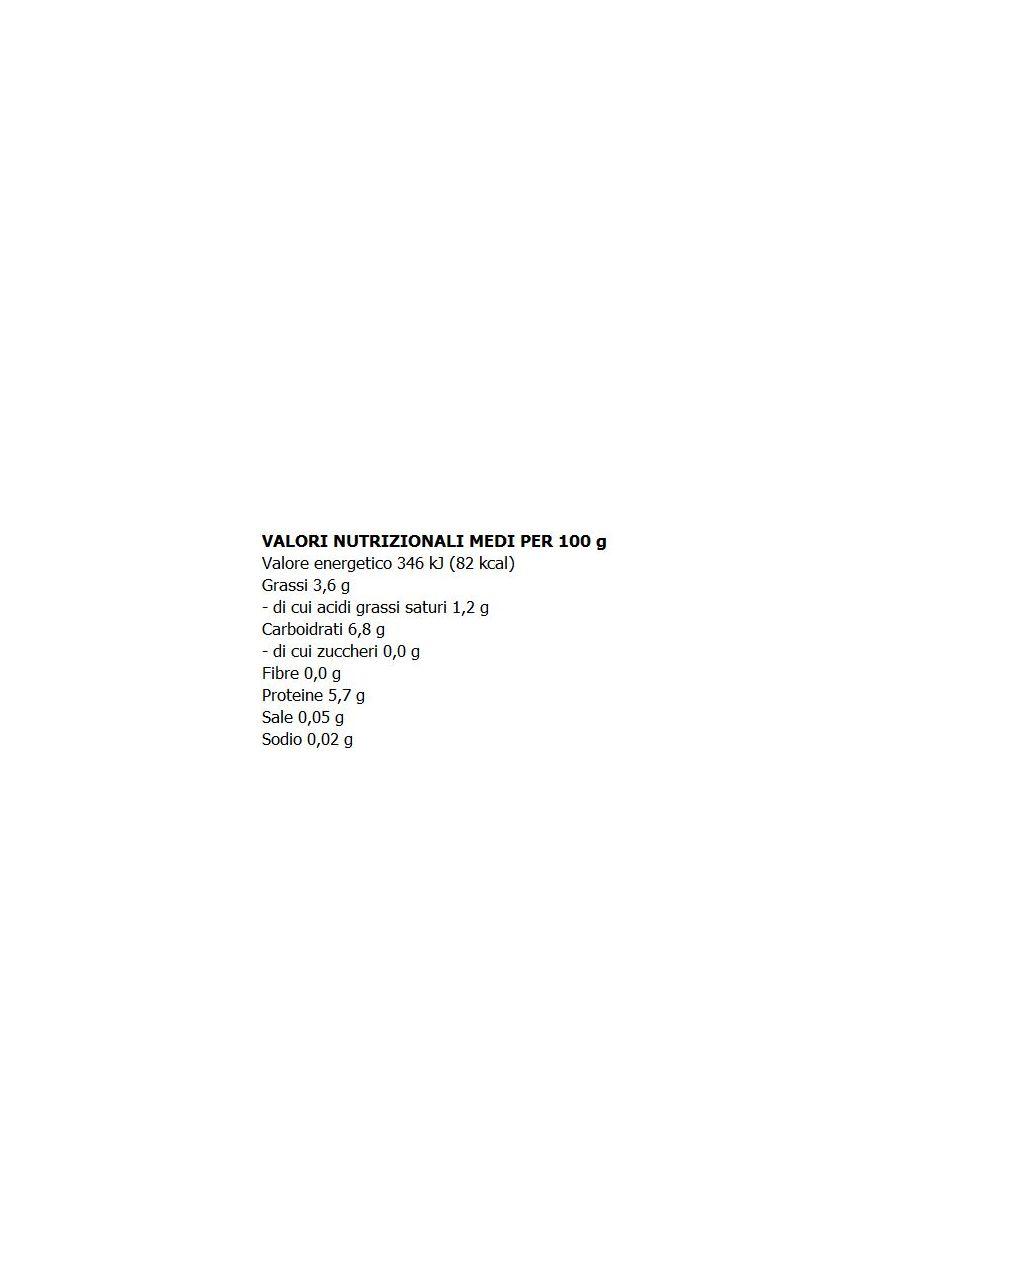 Hipp - omogeneizzato pollo 4x80g - Hipp